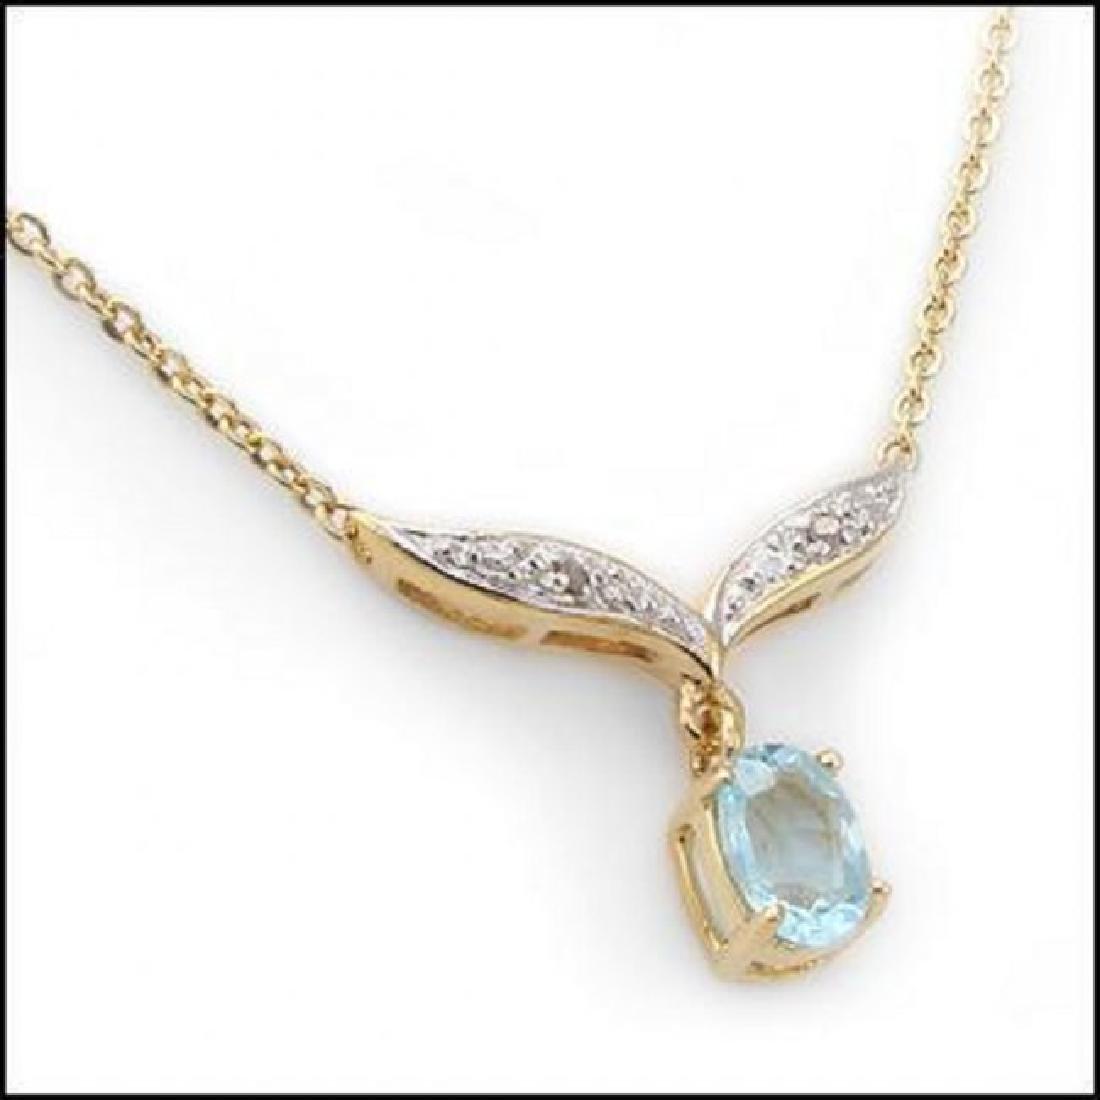 2.91 CT Blue Topaz & Diamond Fine Necklace $820